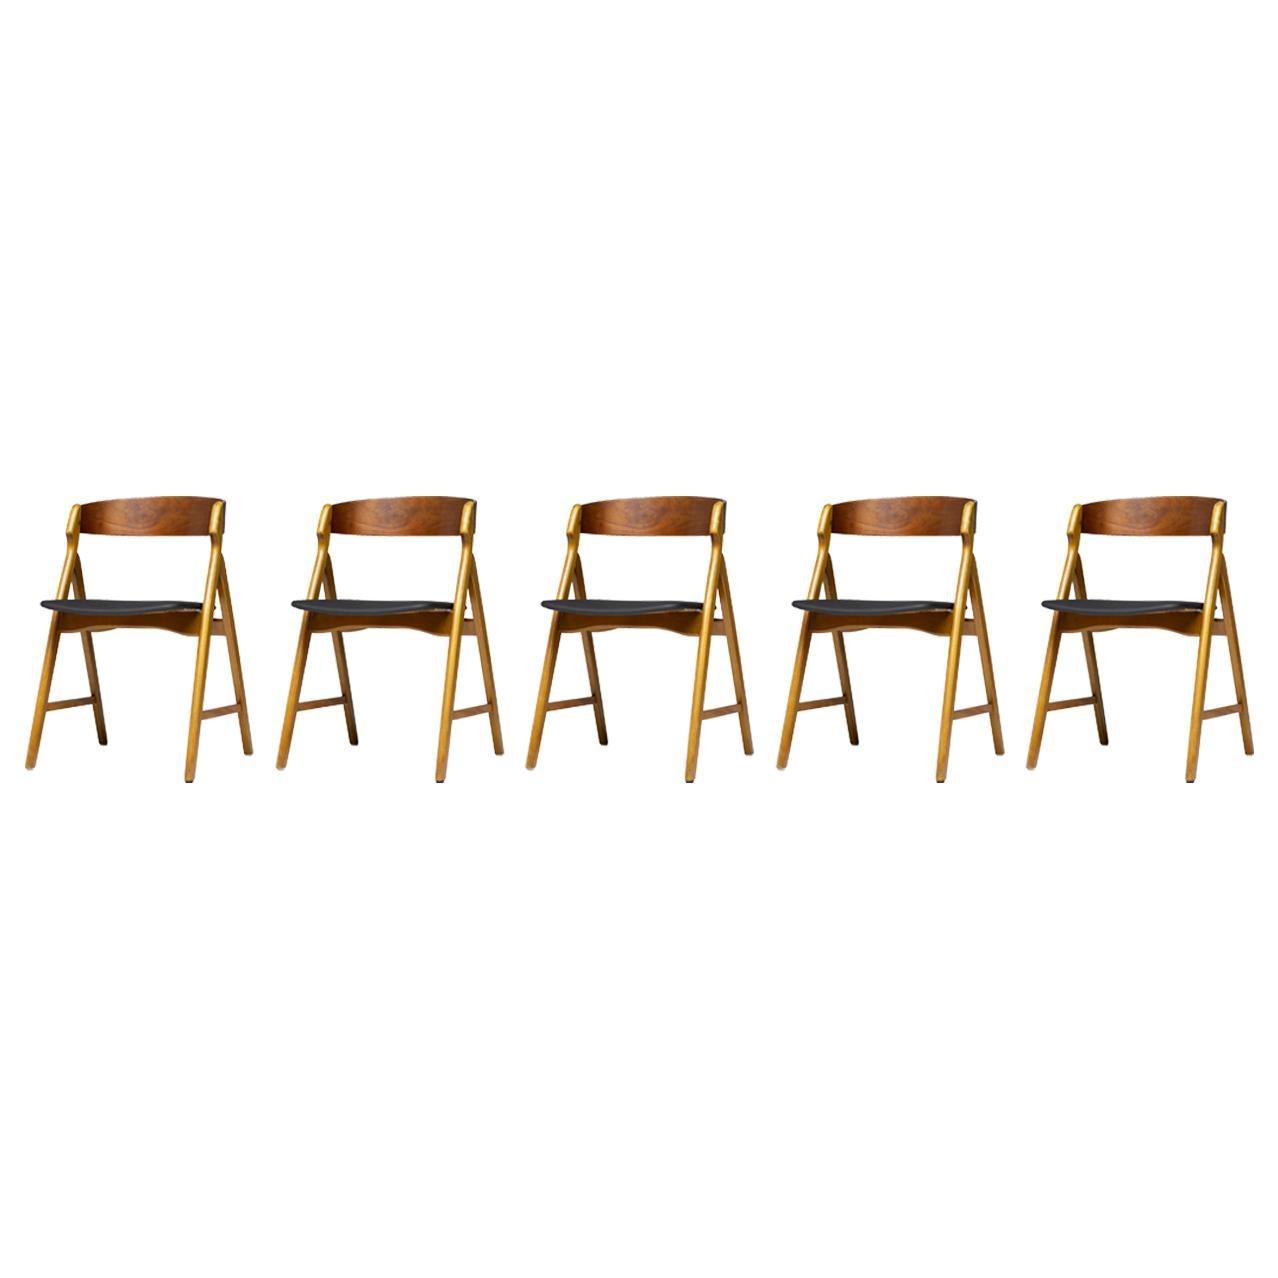 Set of Five Kai Kristiansen Teak Dining Chairs